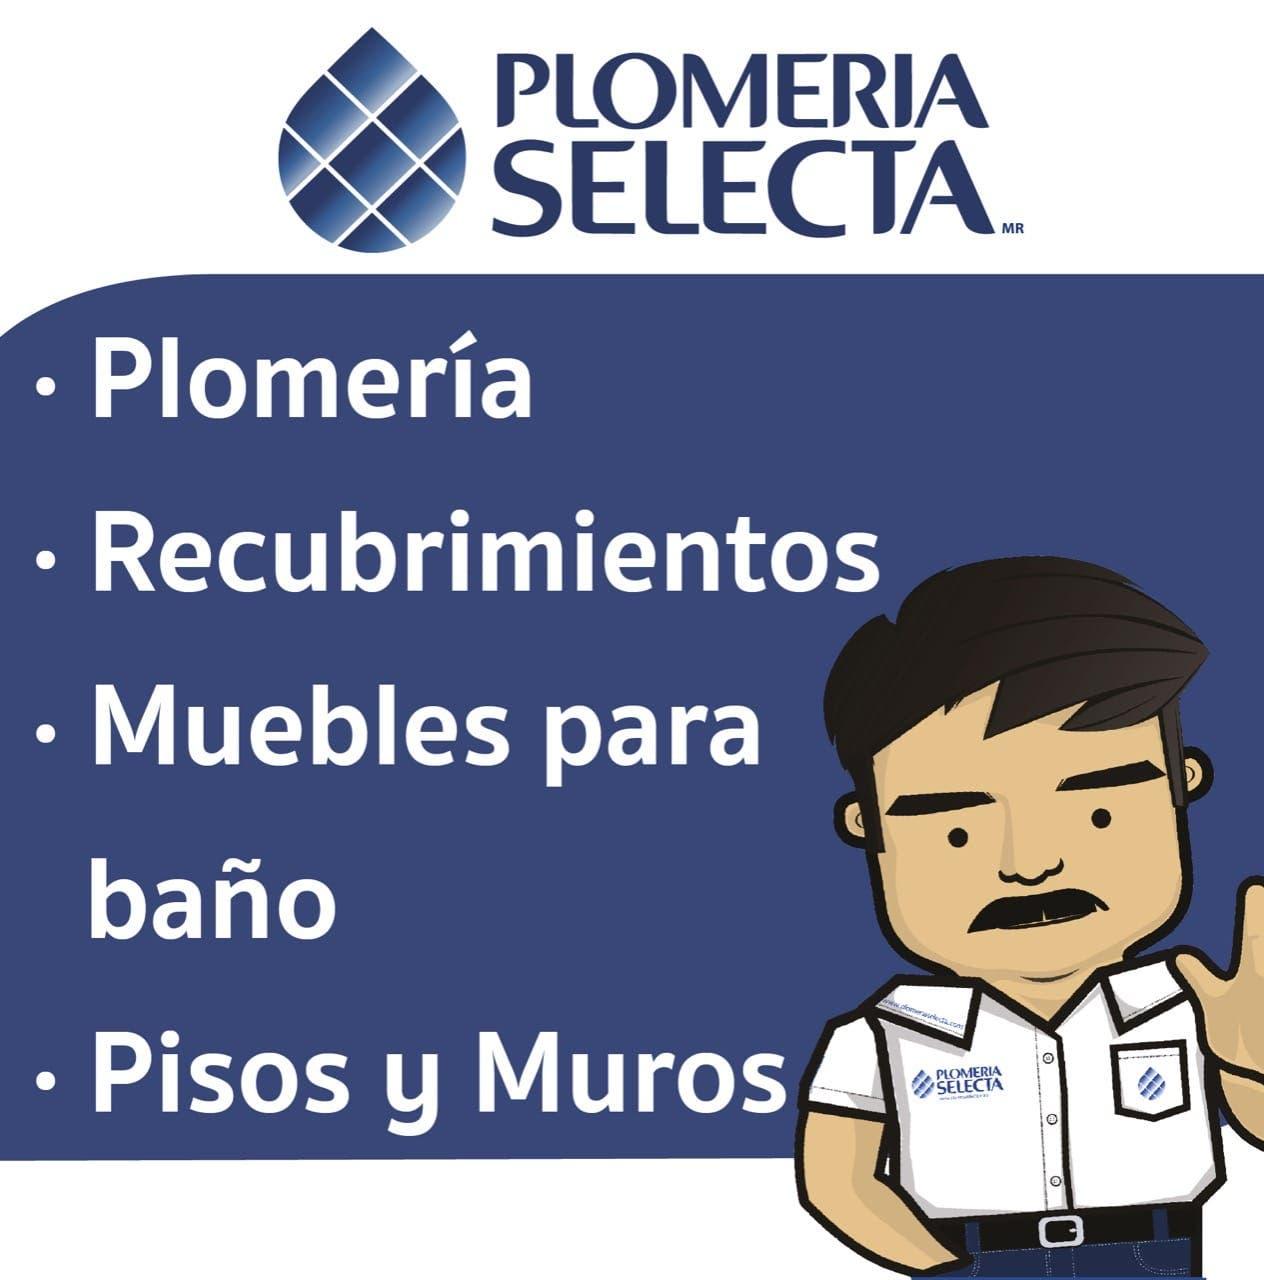 PLOMERIA SELECTA